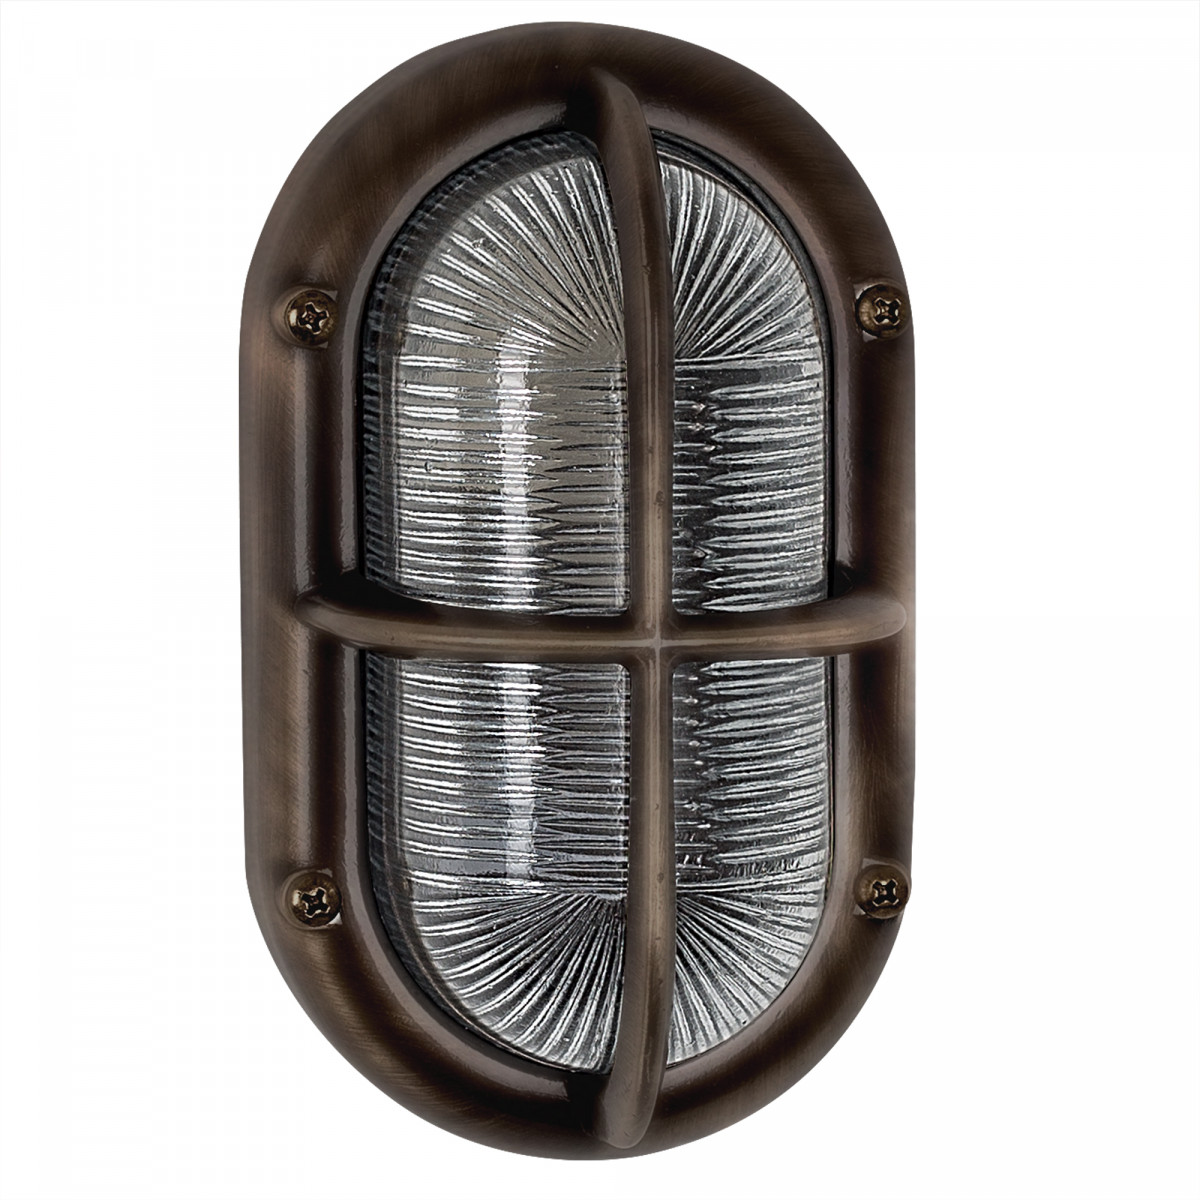 Oculus Zwart Brons (6682) - KS Verlichting - Maritiem